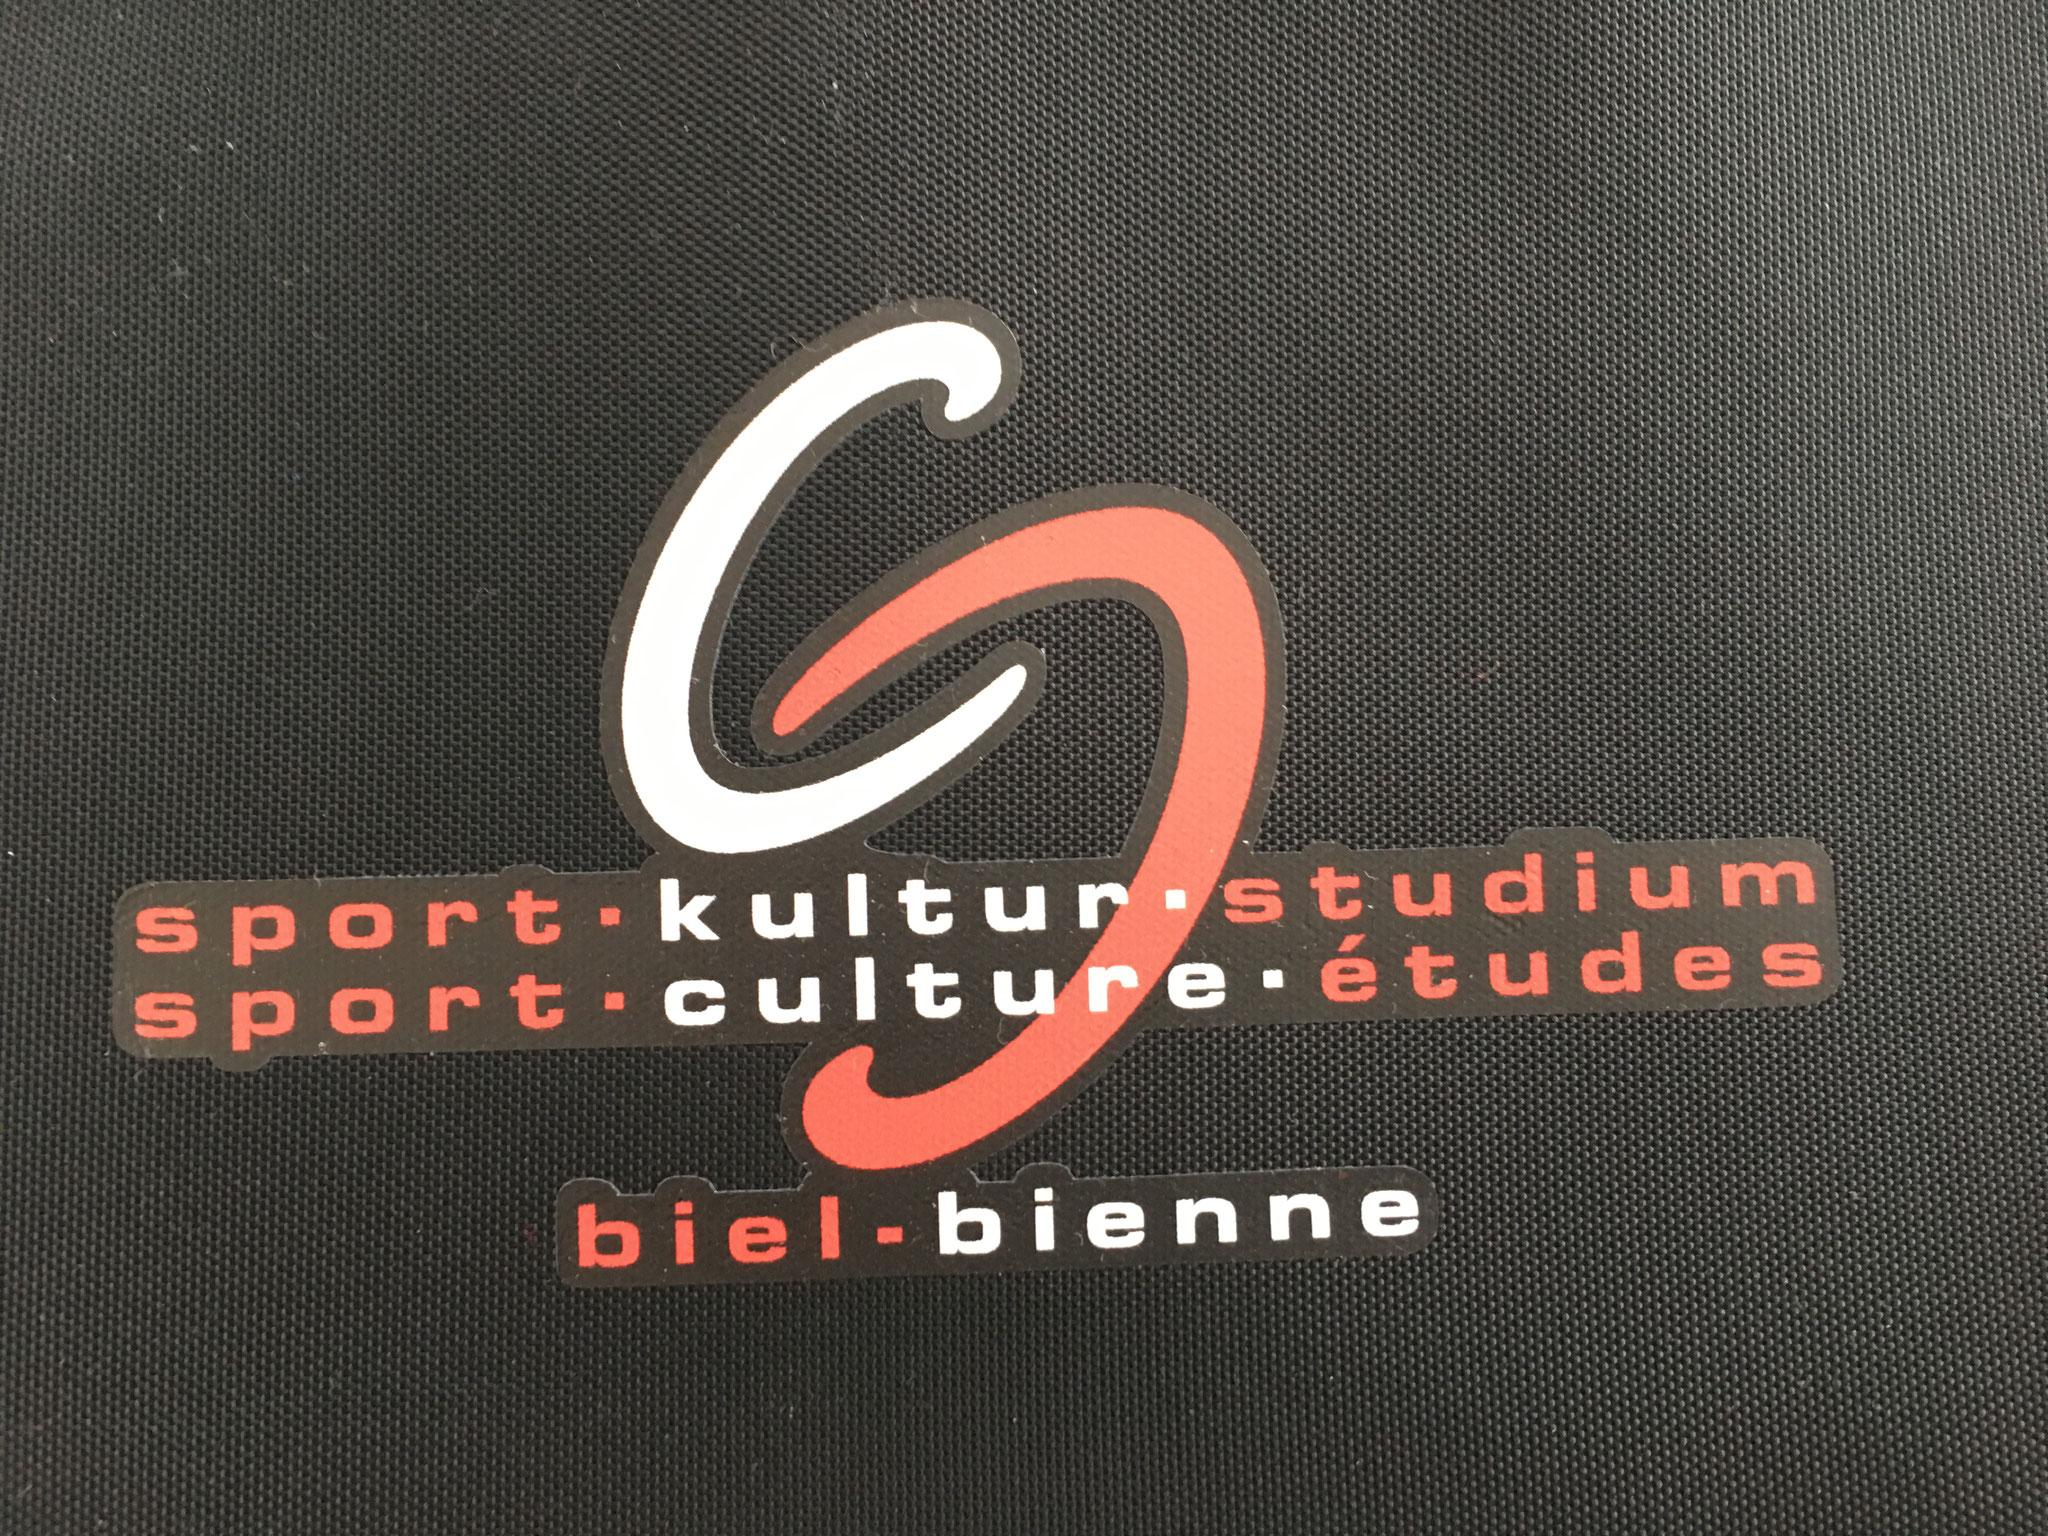 Sport - Kultur - Studium